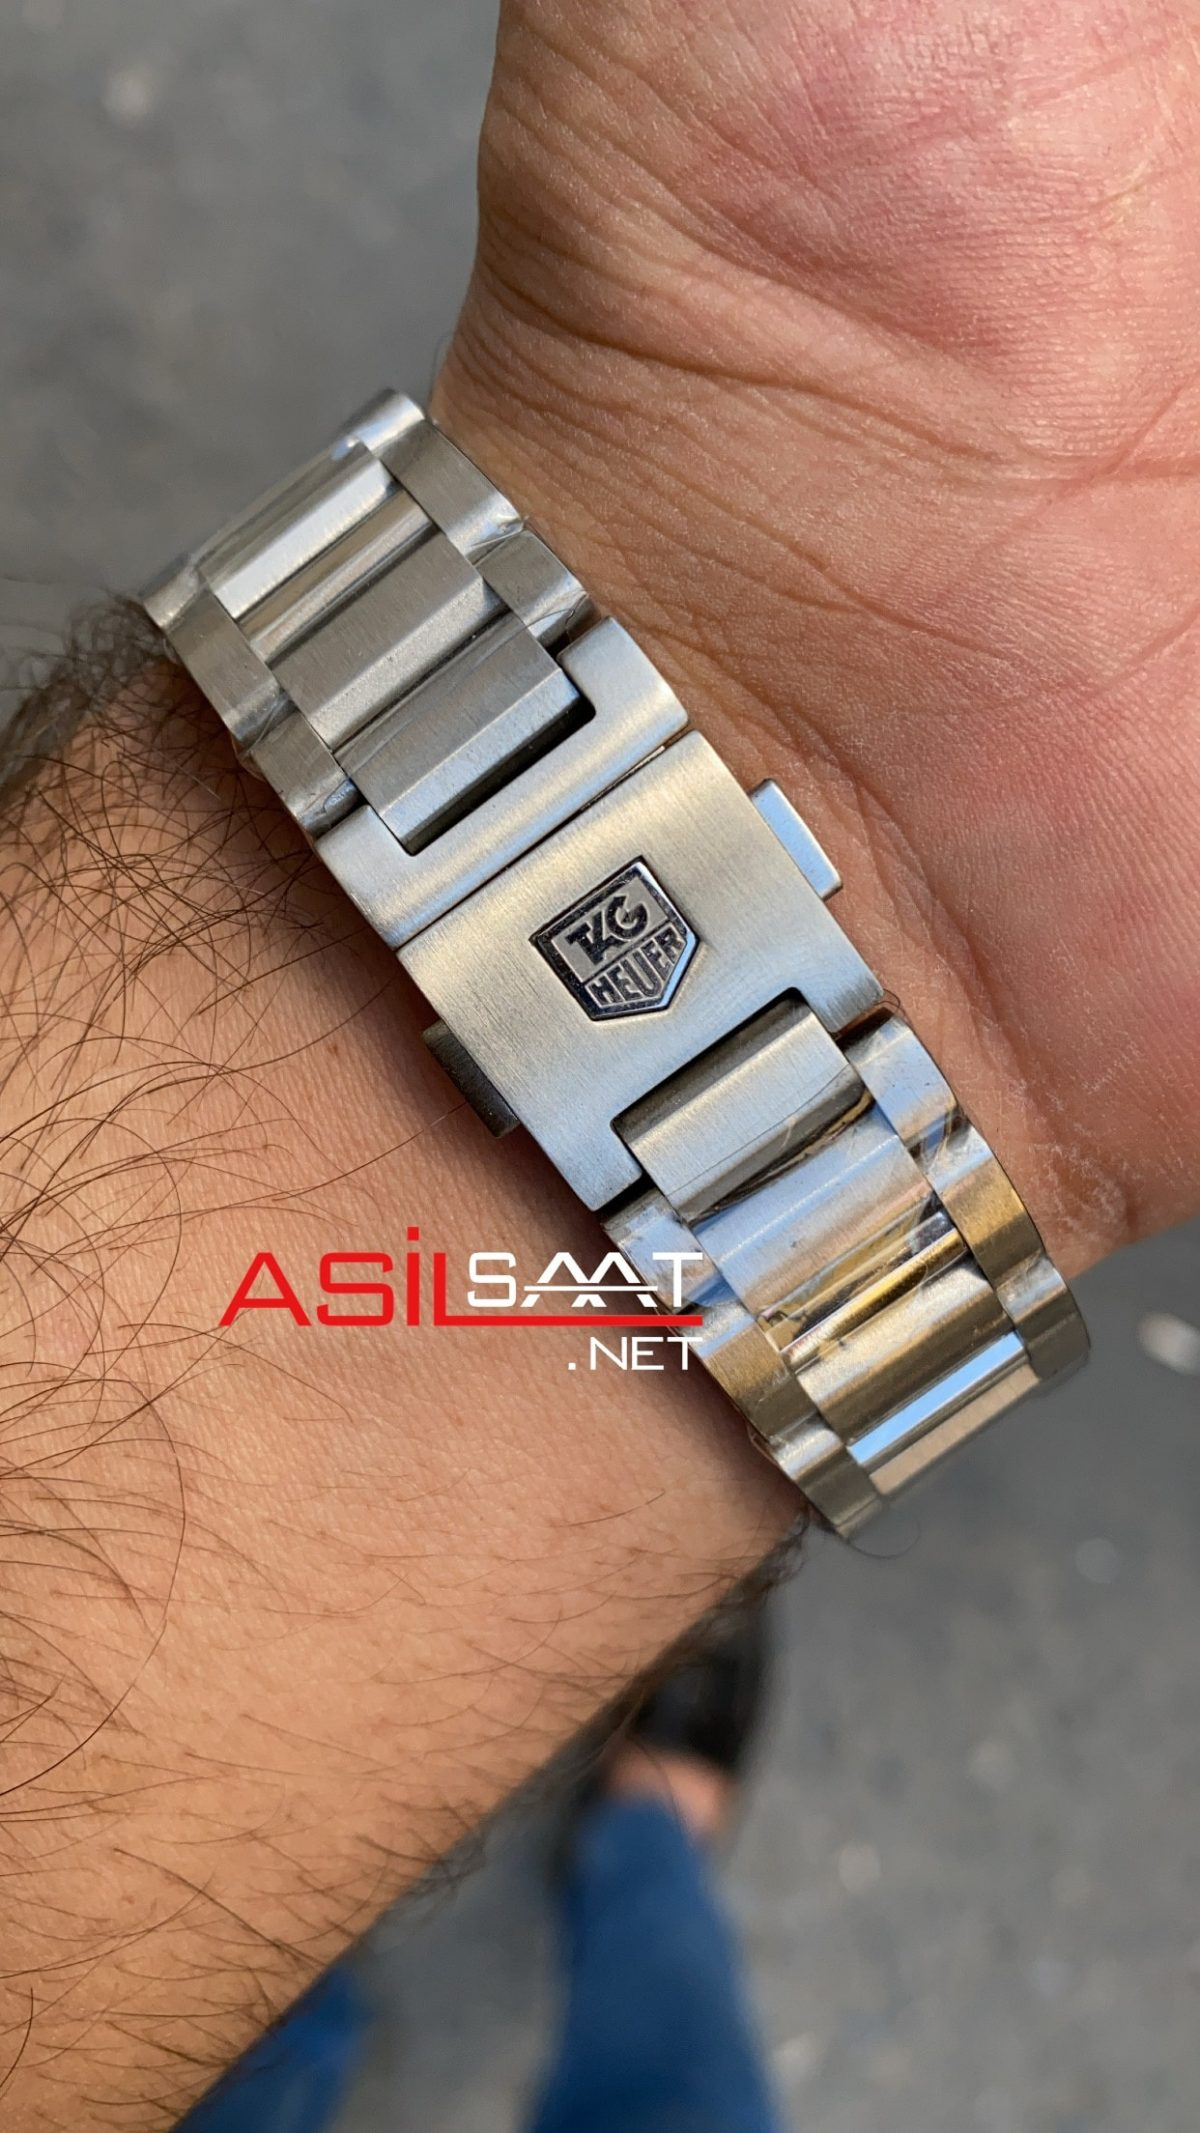 TAG Heuer Carrera Calibre16 Silver Chronograph Replika Saat TAGC16001